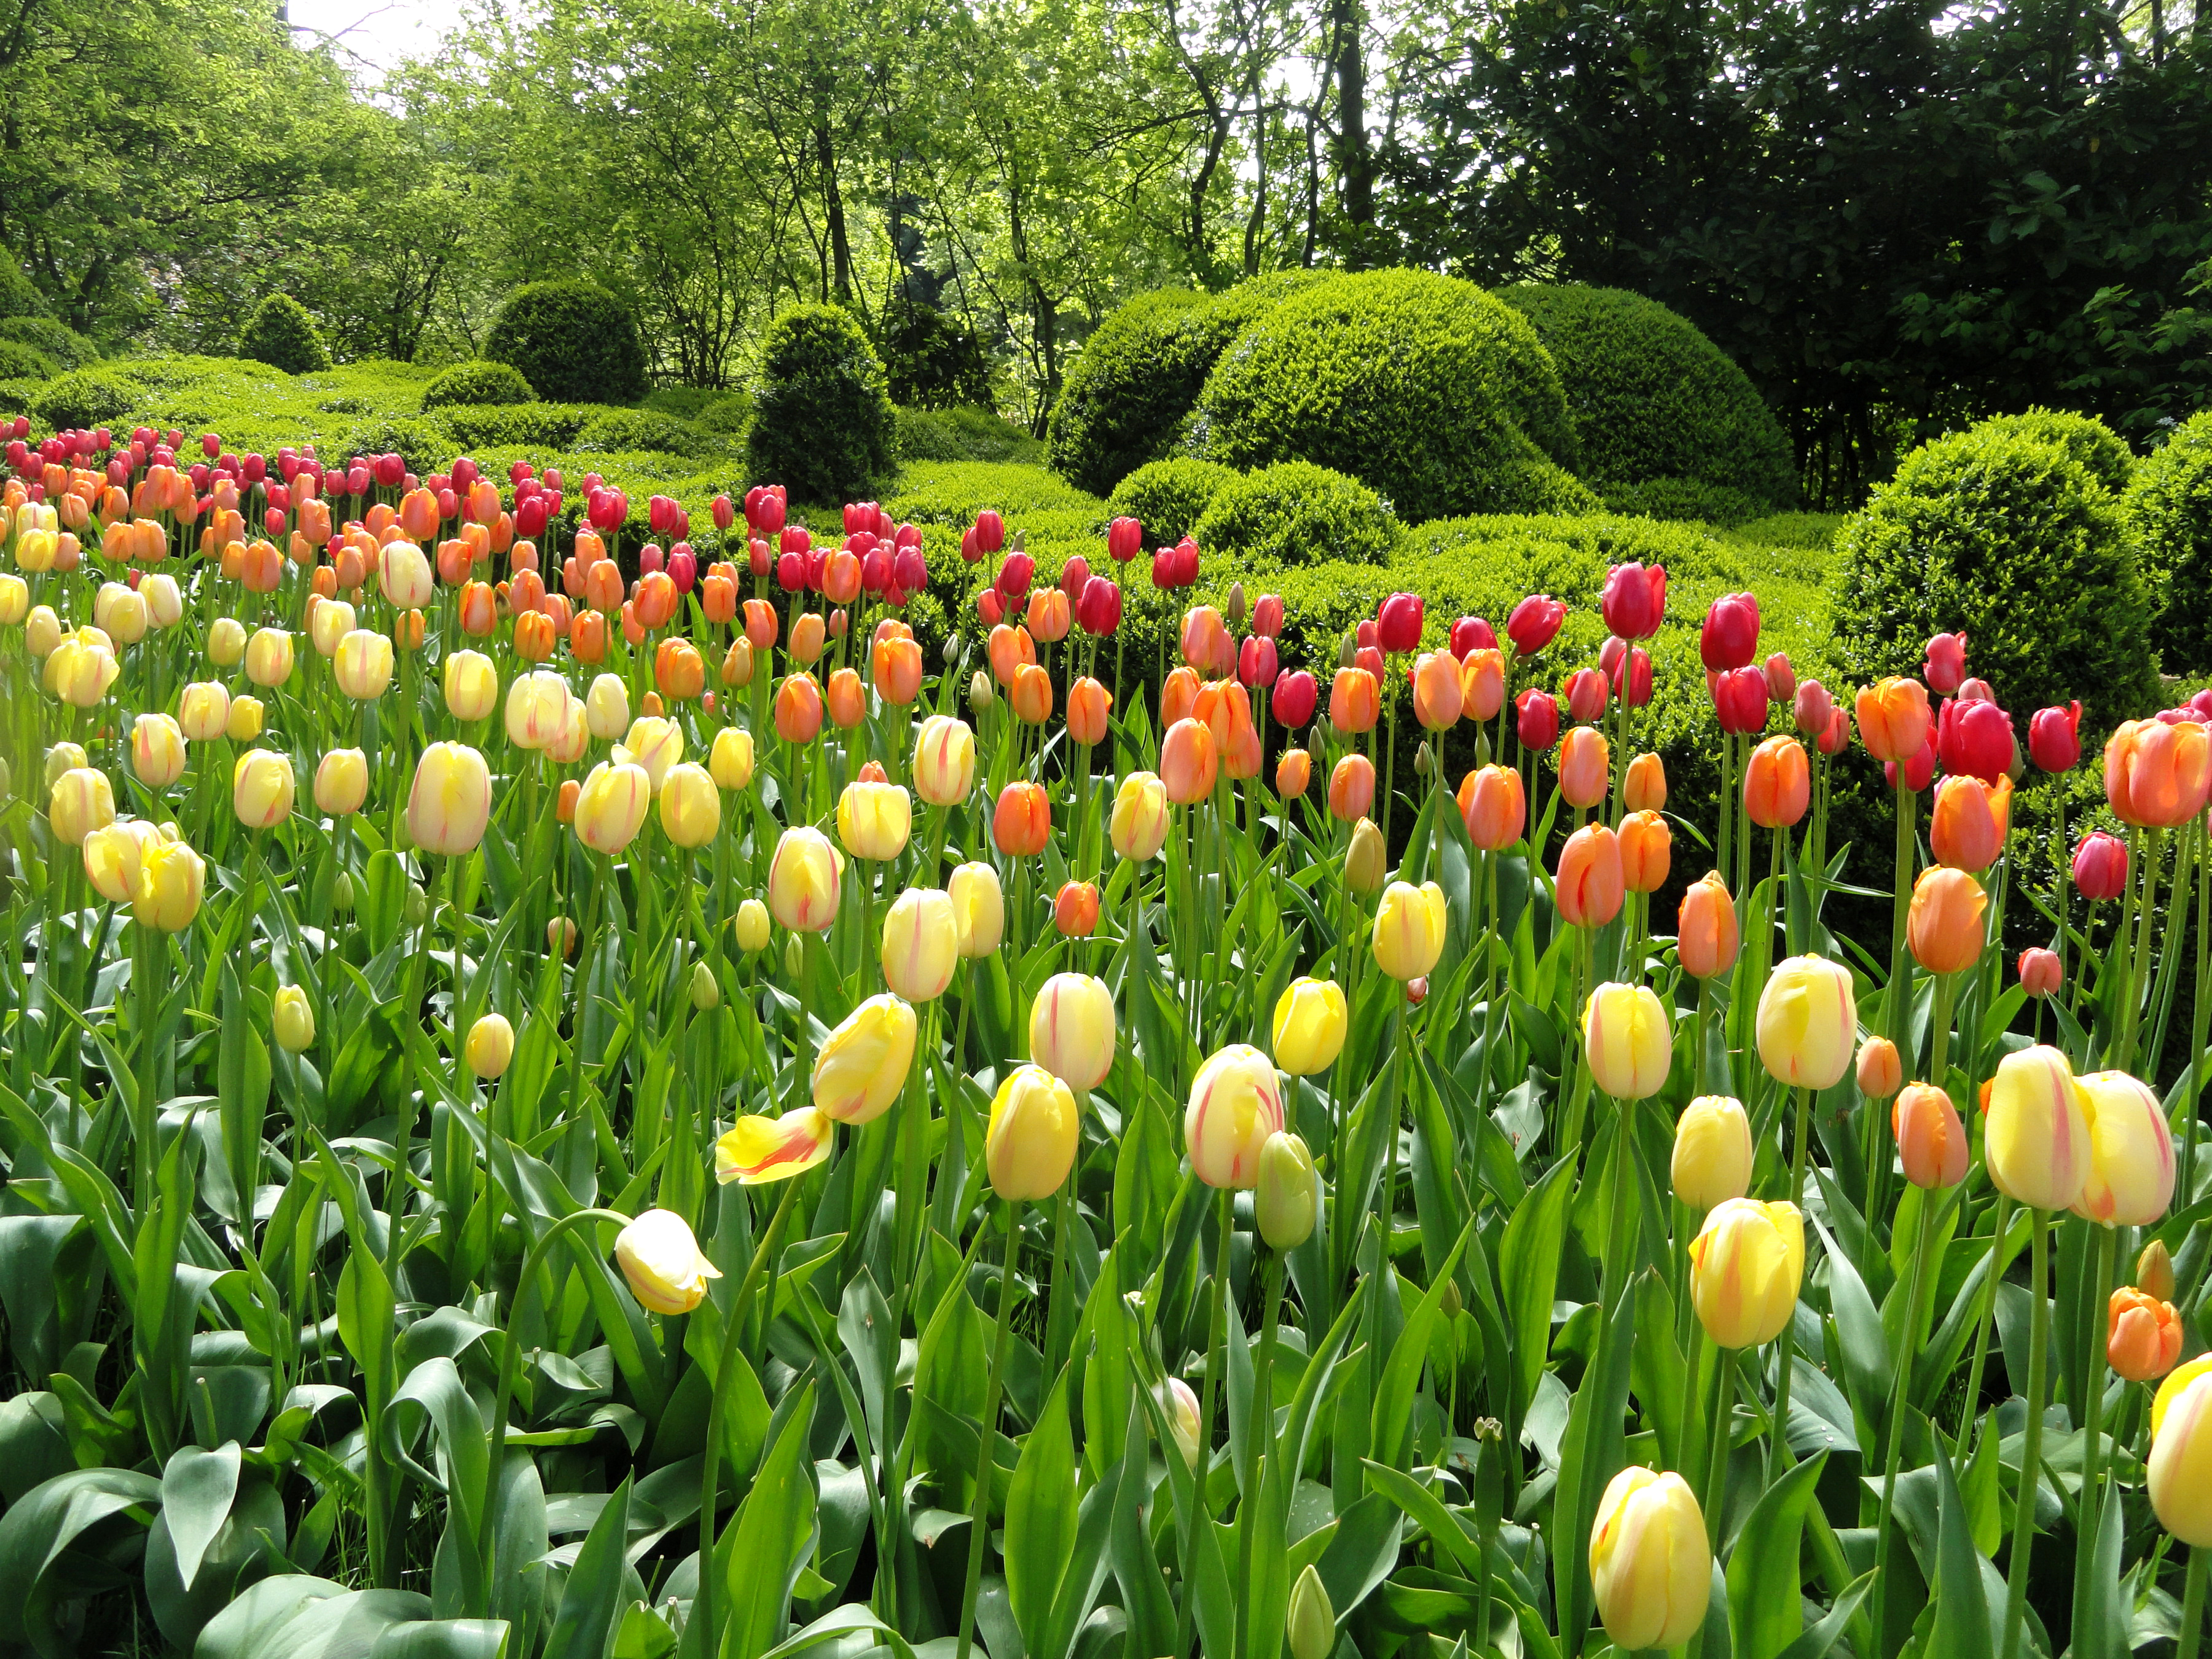 тюльпаны клумба  № 1349312 бесплатно